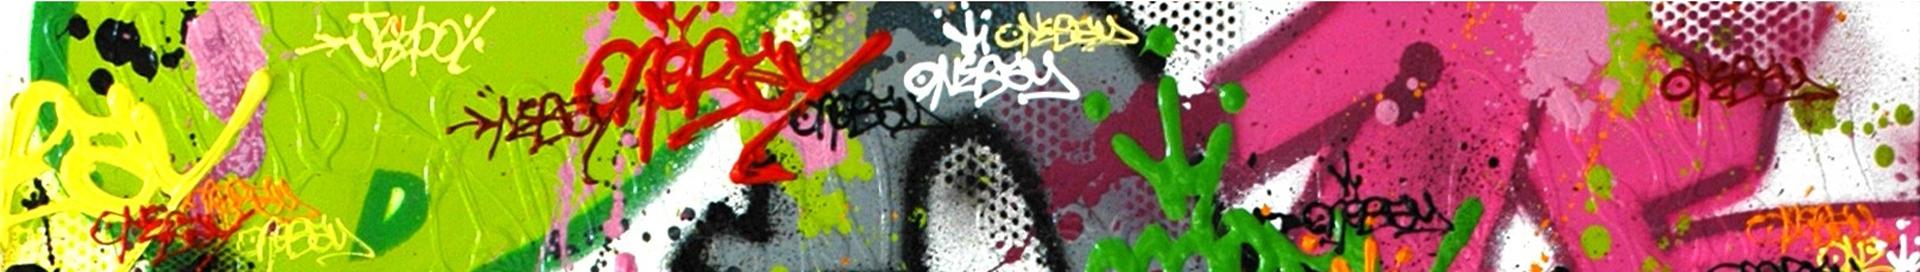 nebay street artiste, NEBAY – Street Artist